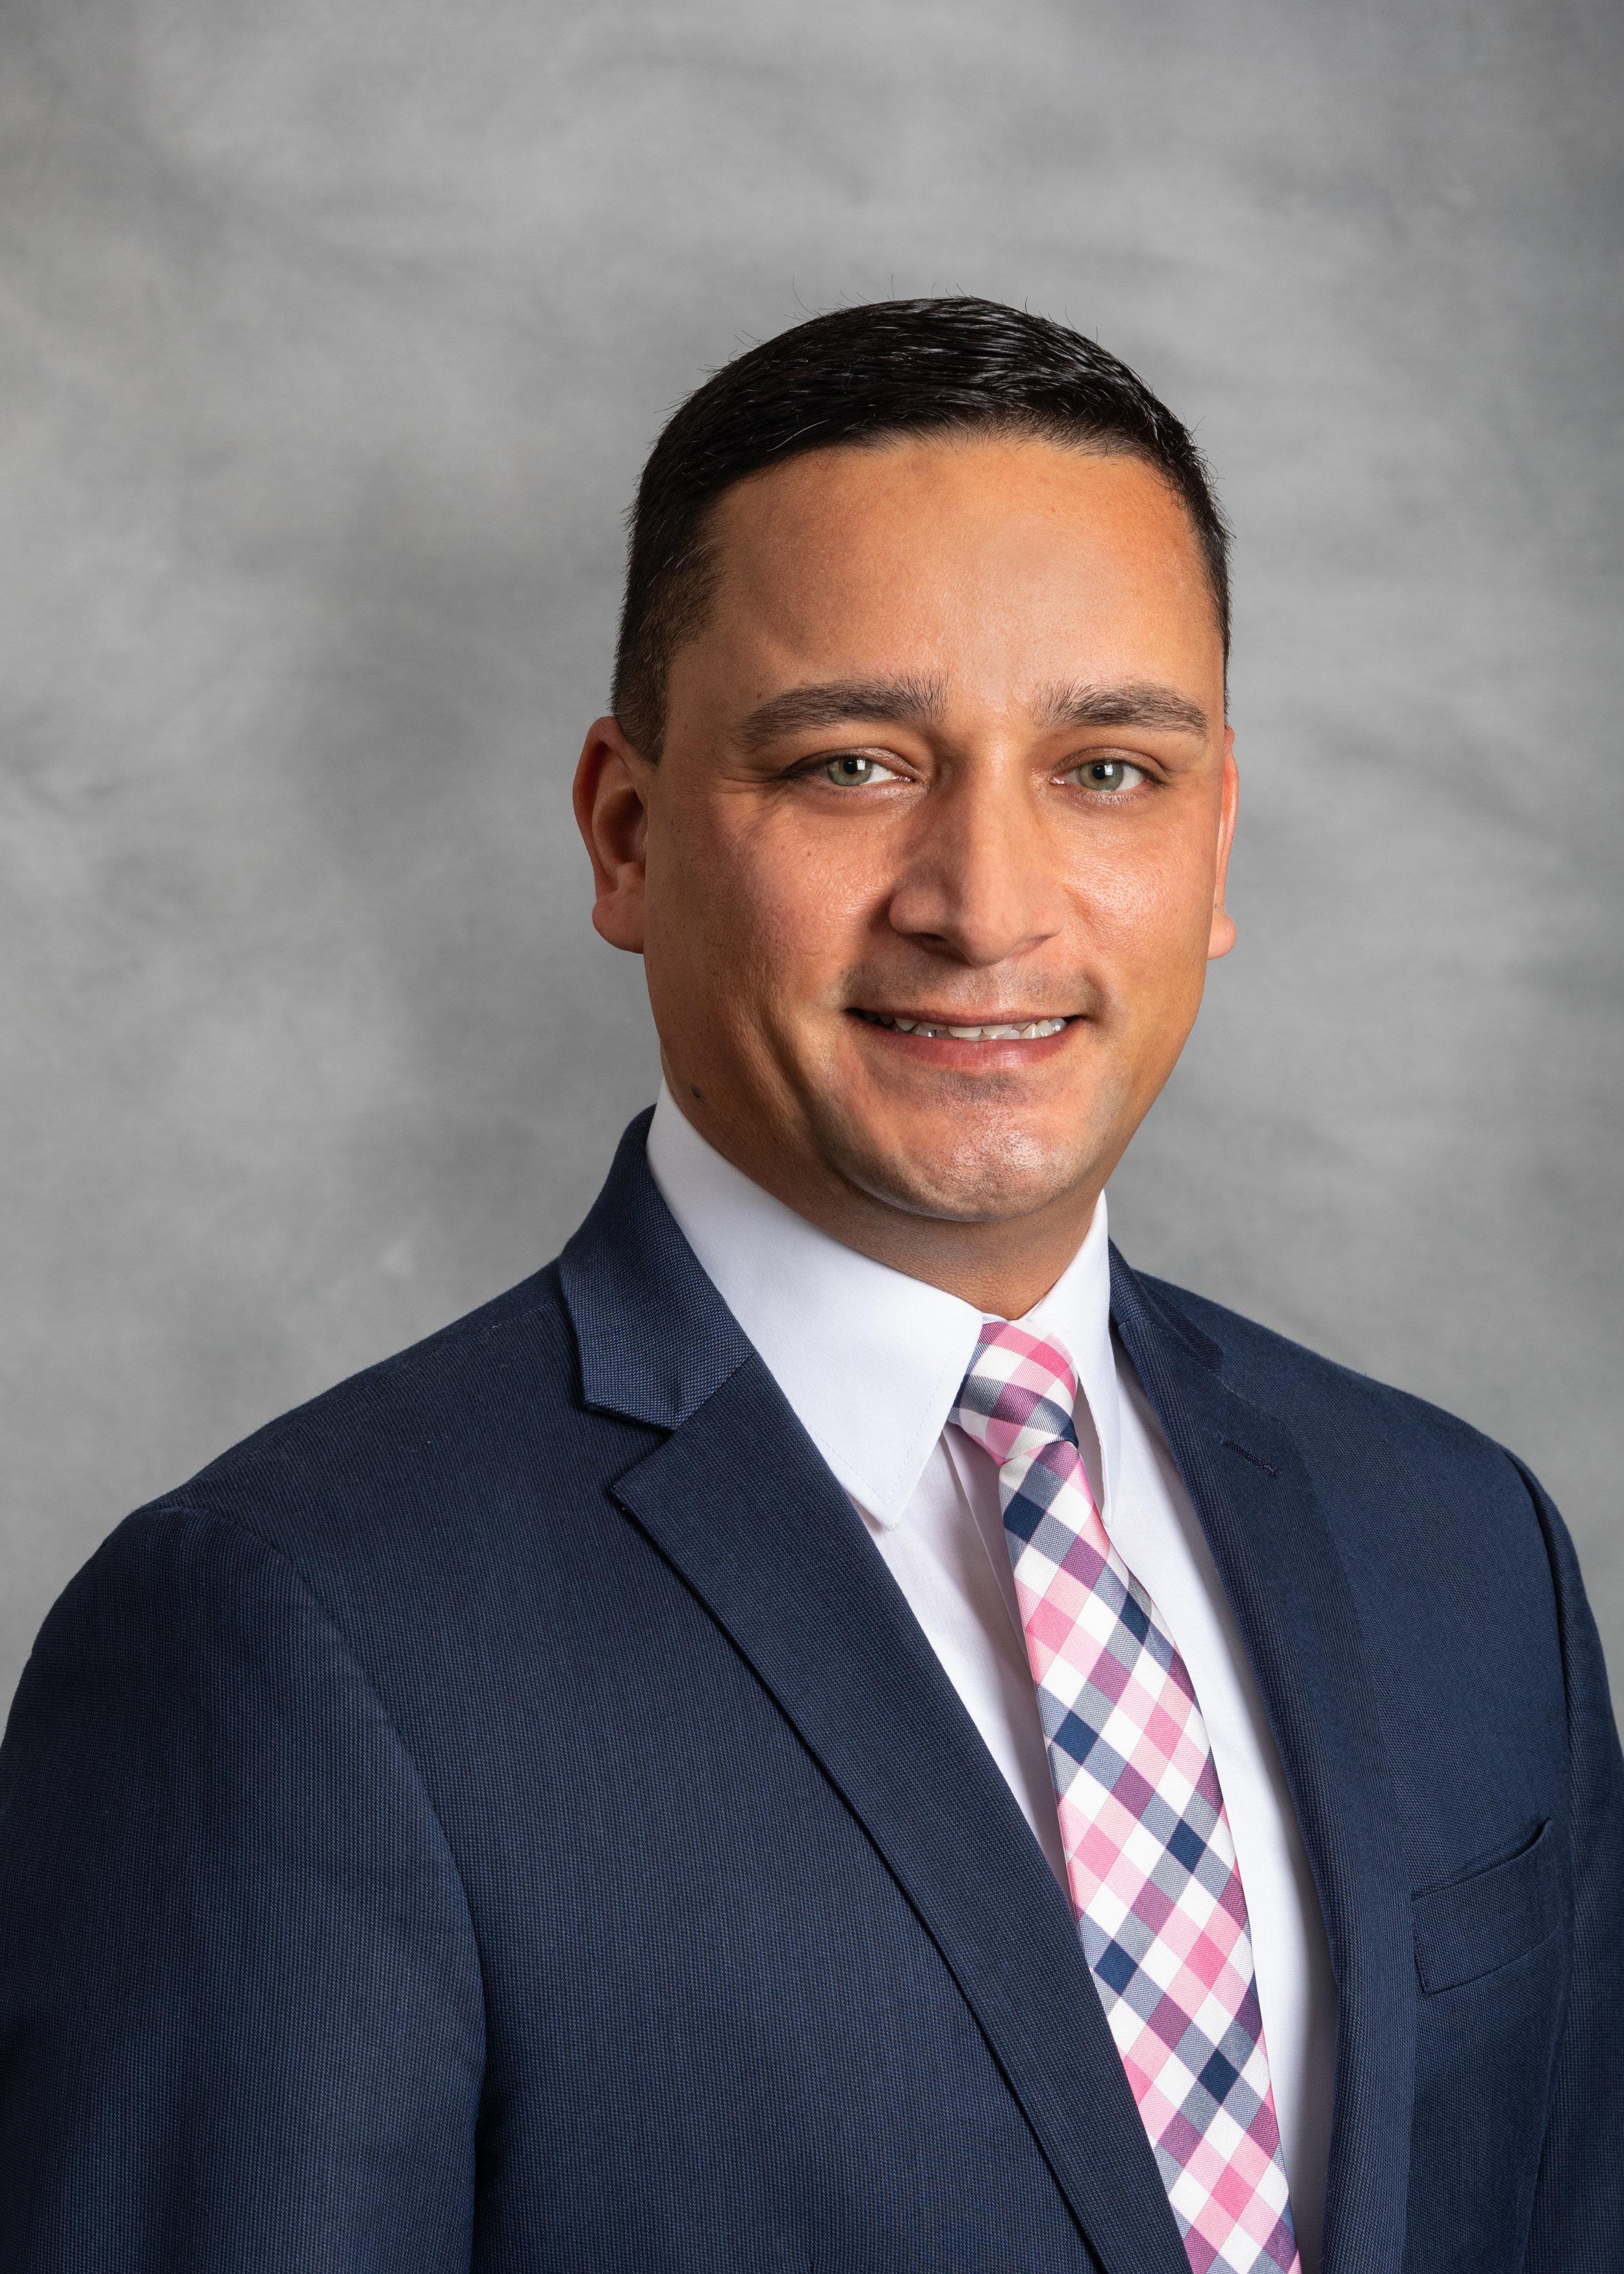 Patrick L. Bravo, MPA, JD  Executive Director  (330) 926-2508  pbravo@summitlandbank.org